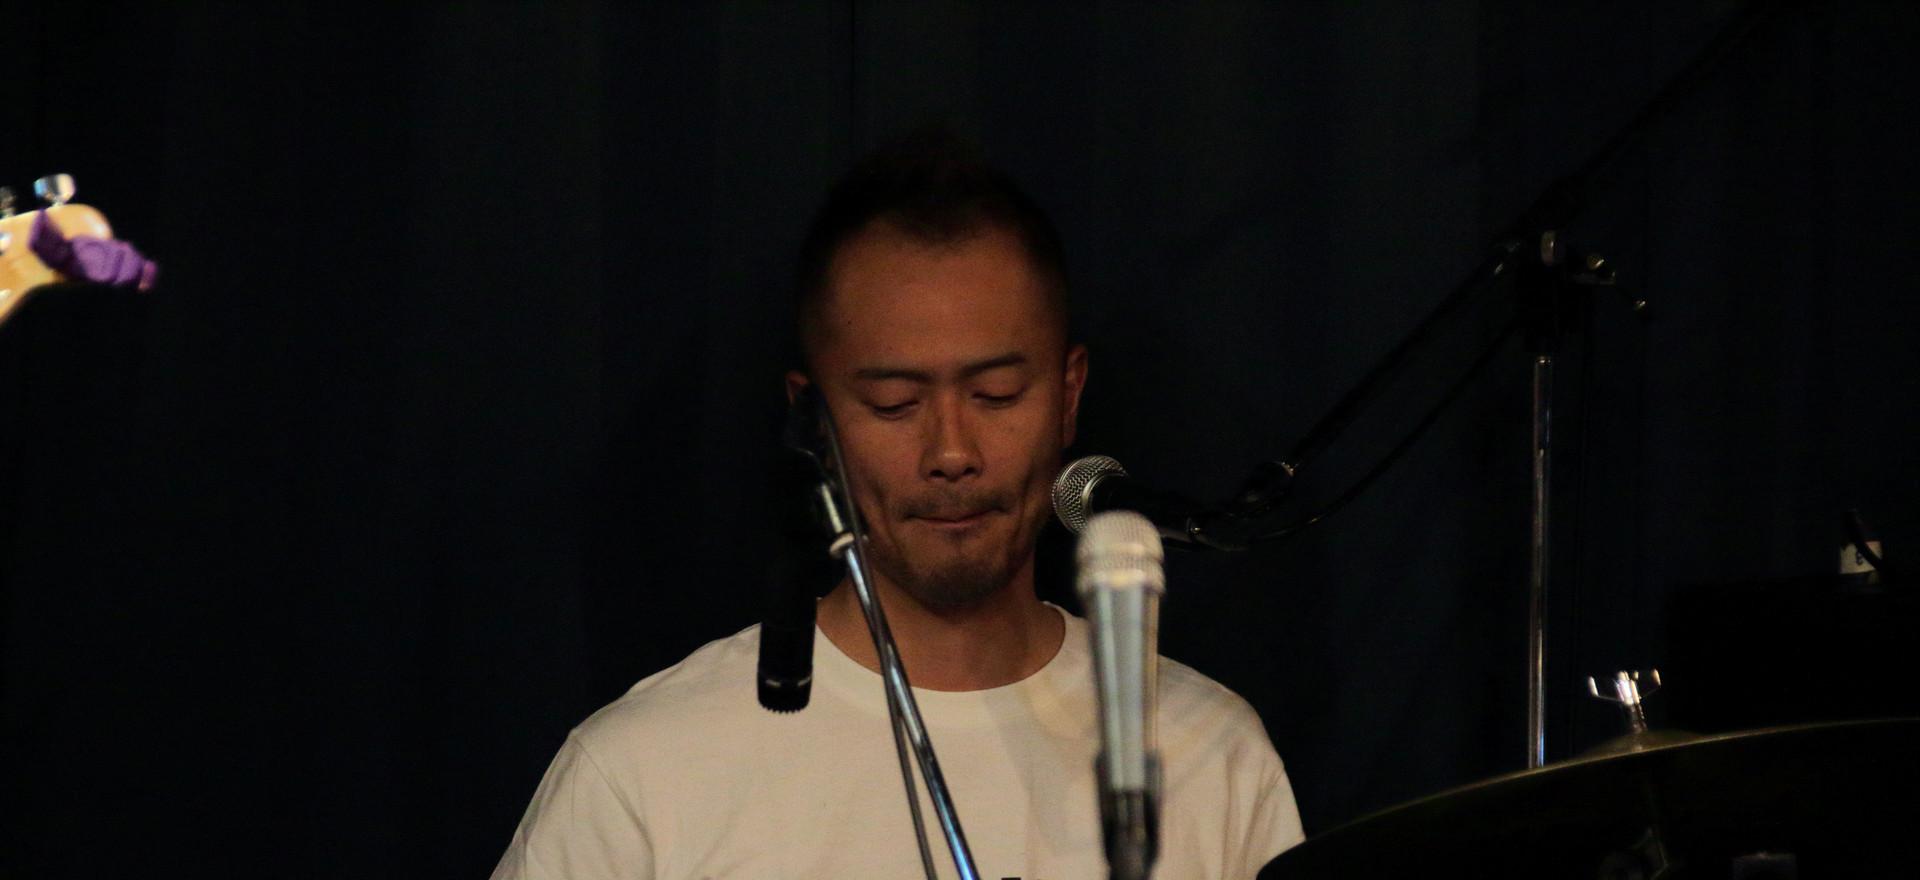 Drums 渡辺一史